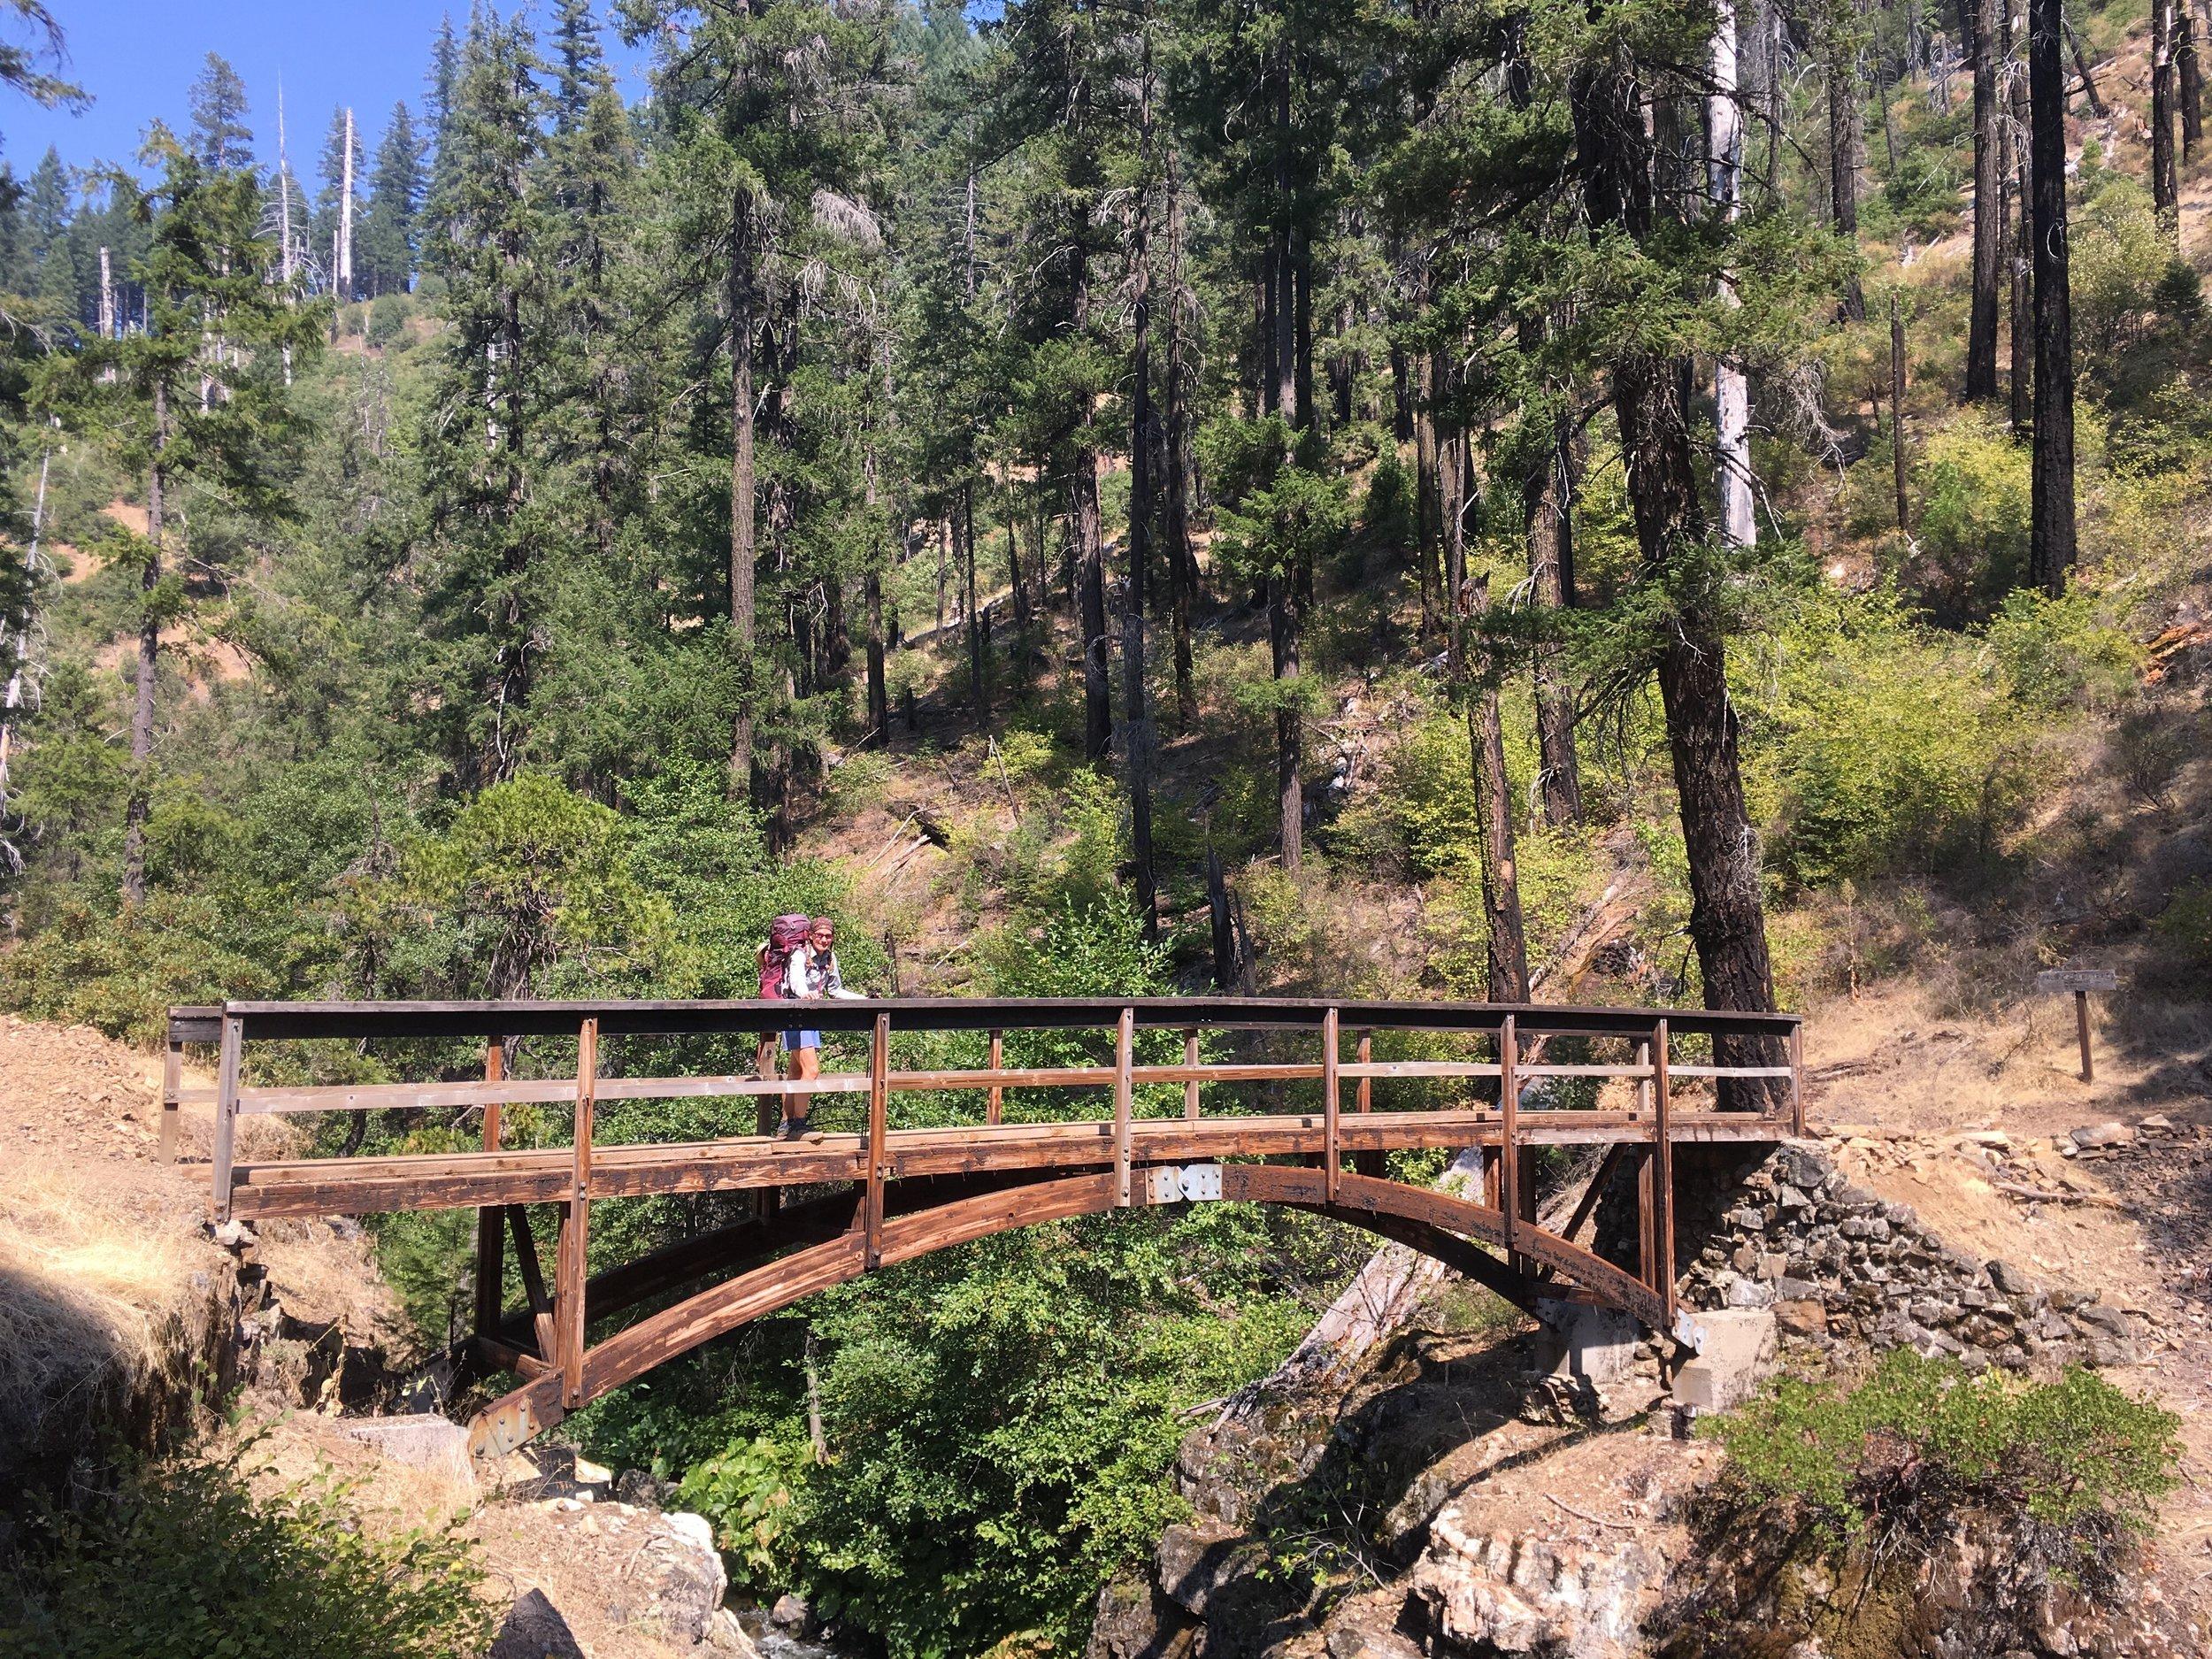 Huckleberry on the bridge over Squaw Valley Creek.